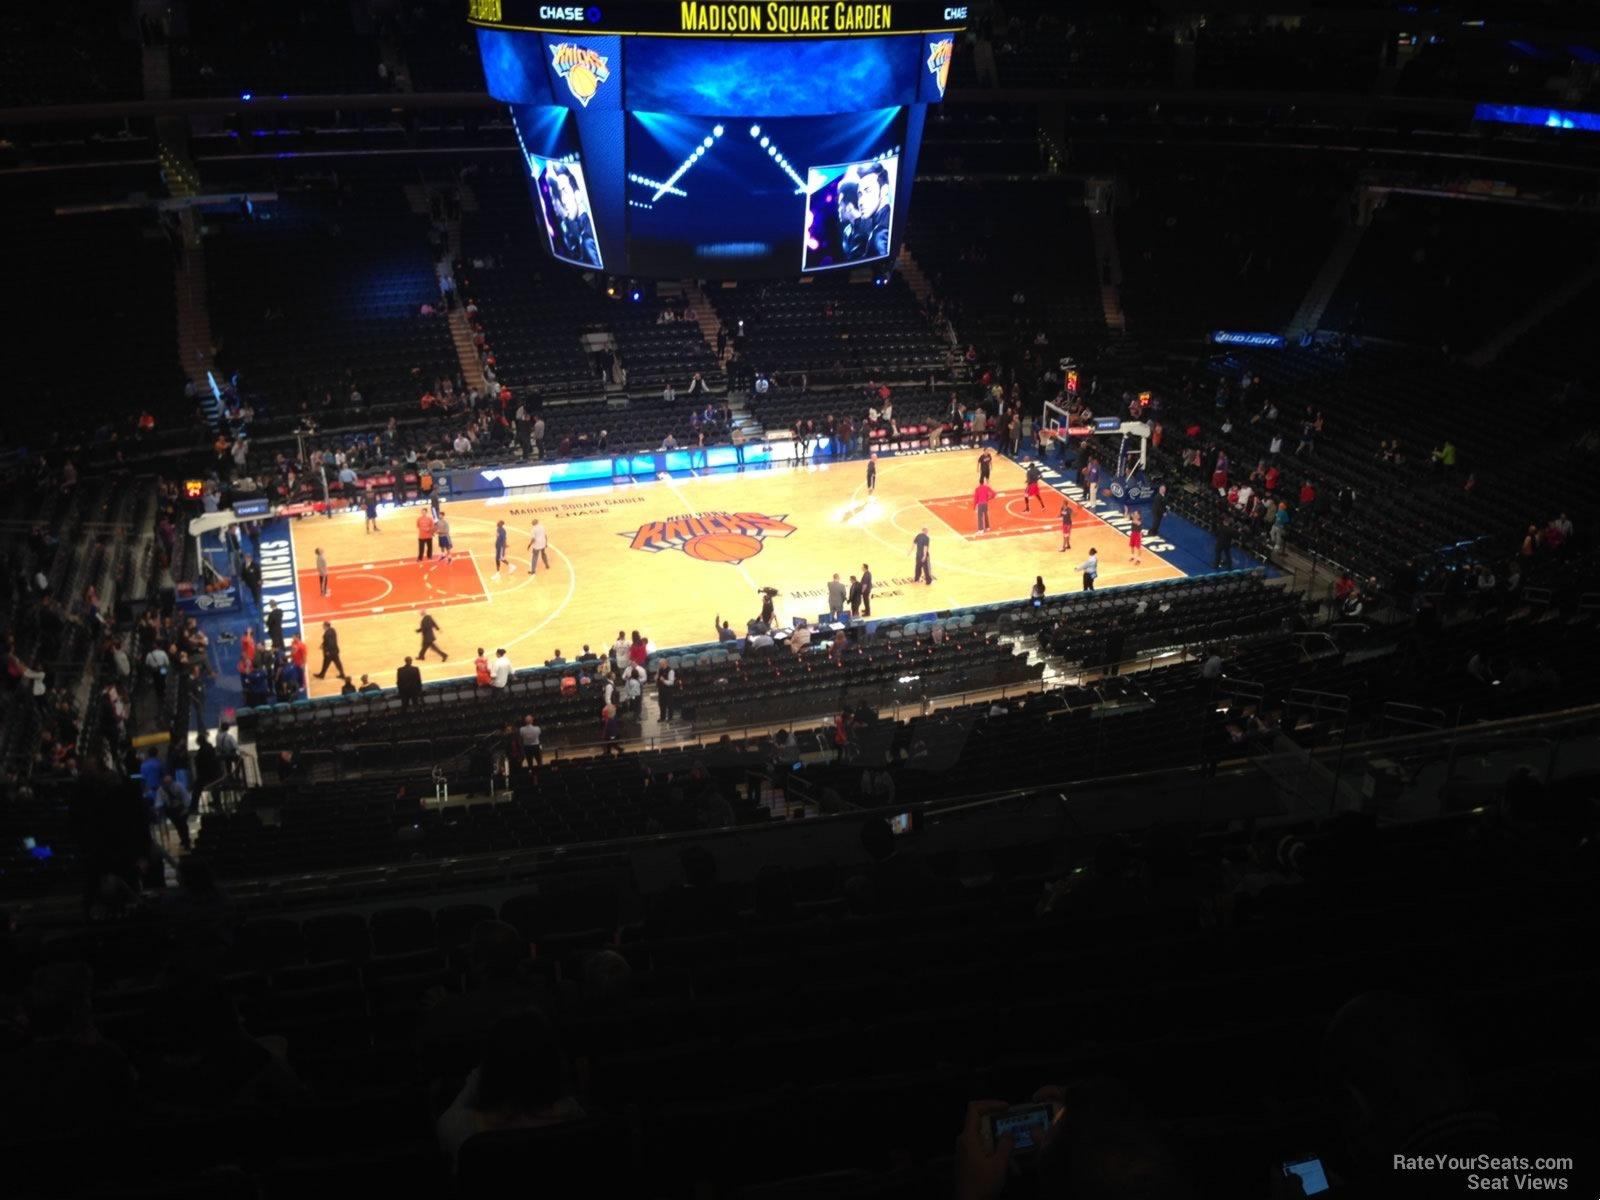 200 Level Center Madison Square Garden Basketball Seating